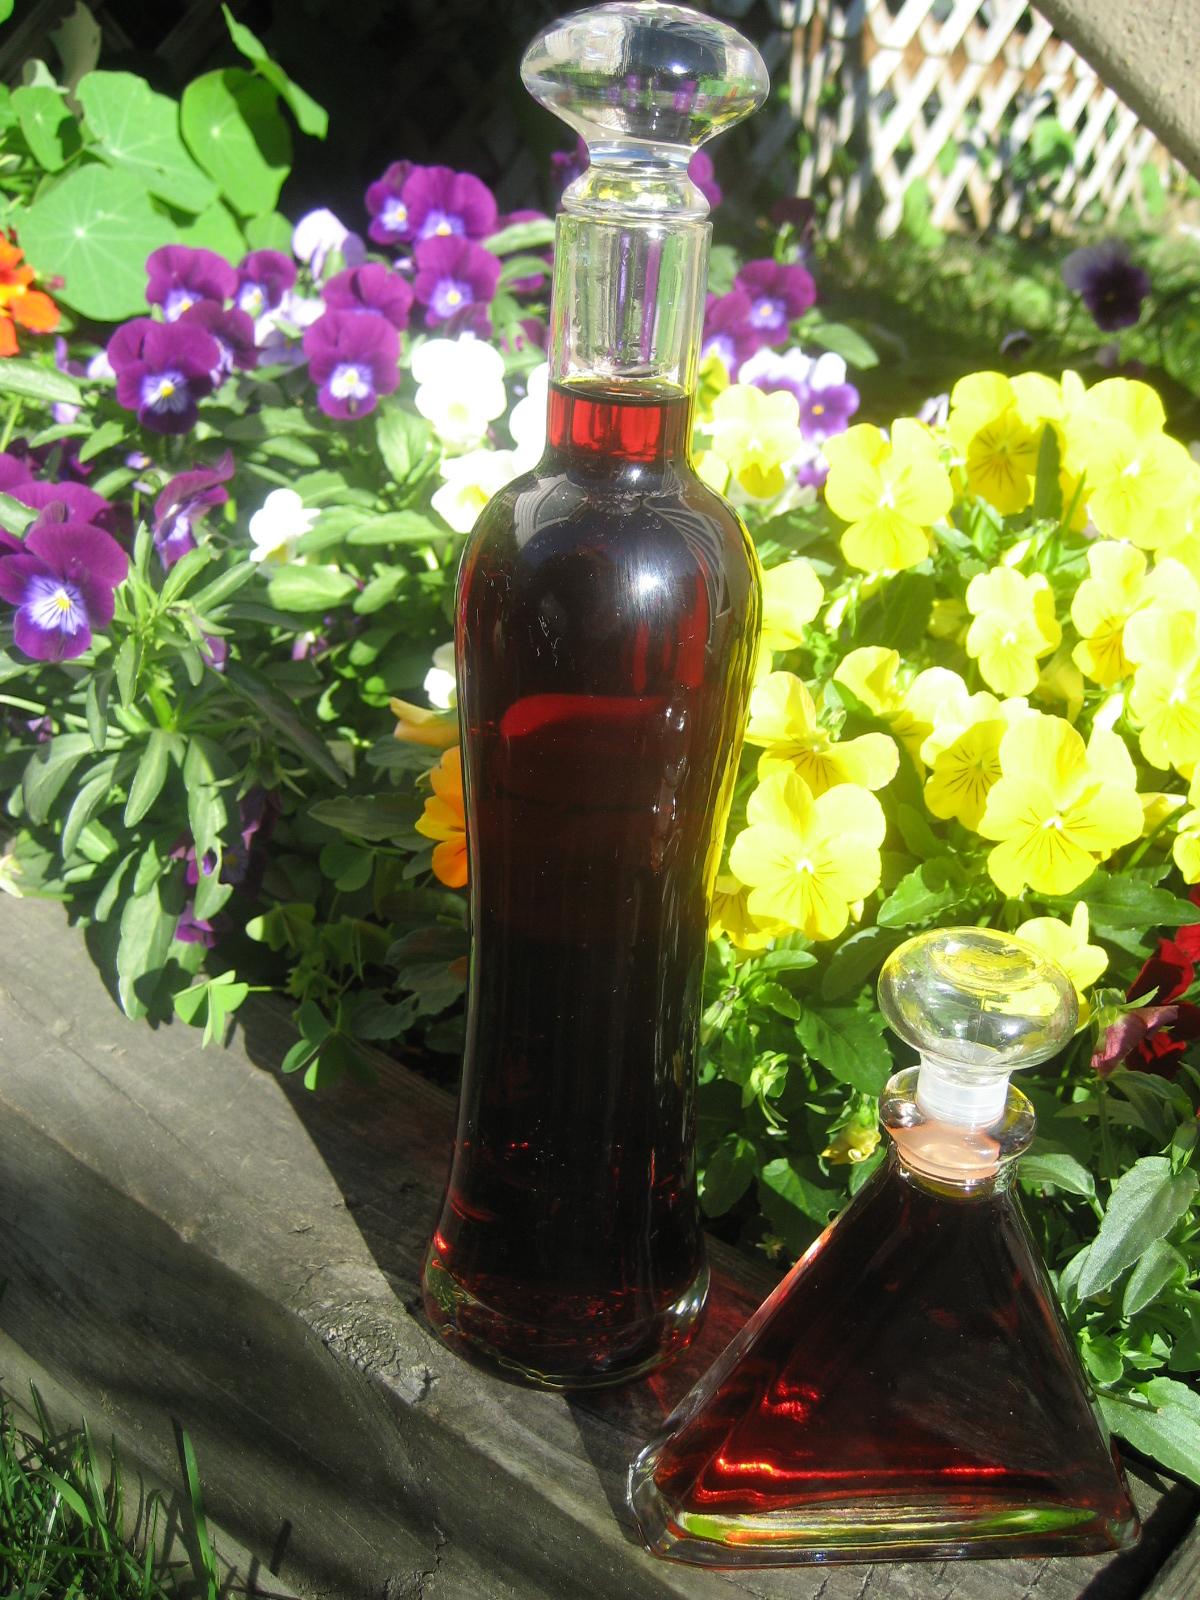 Vinaigre de framboise maison recette - Vinaigre de framboise maison ...